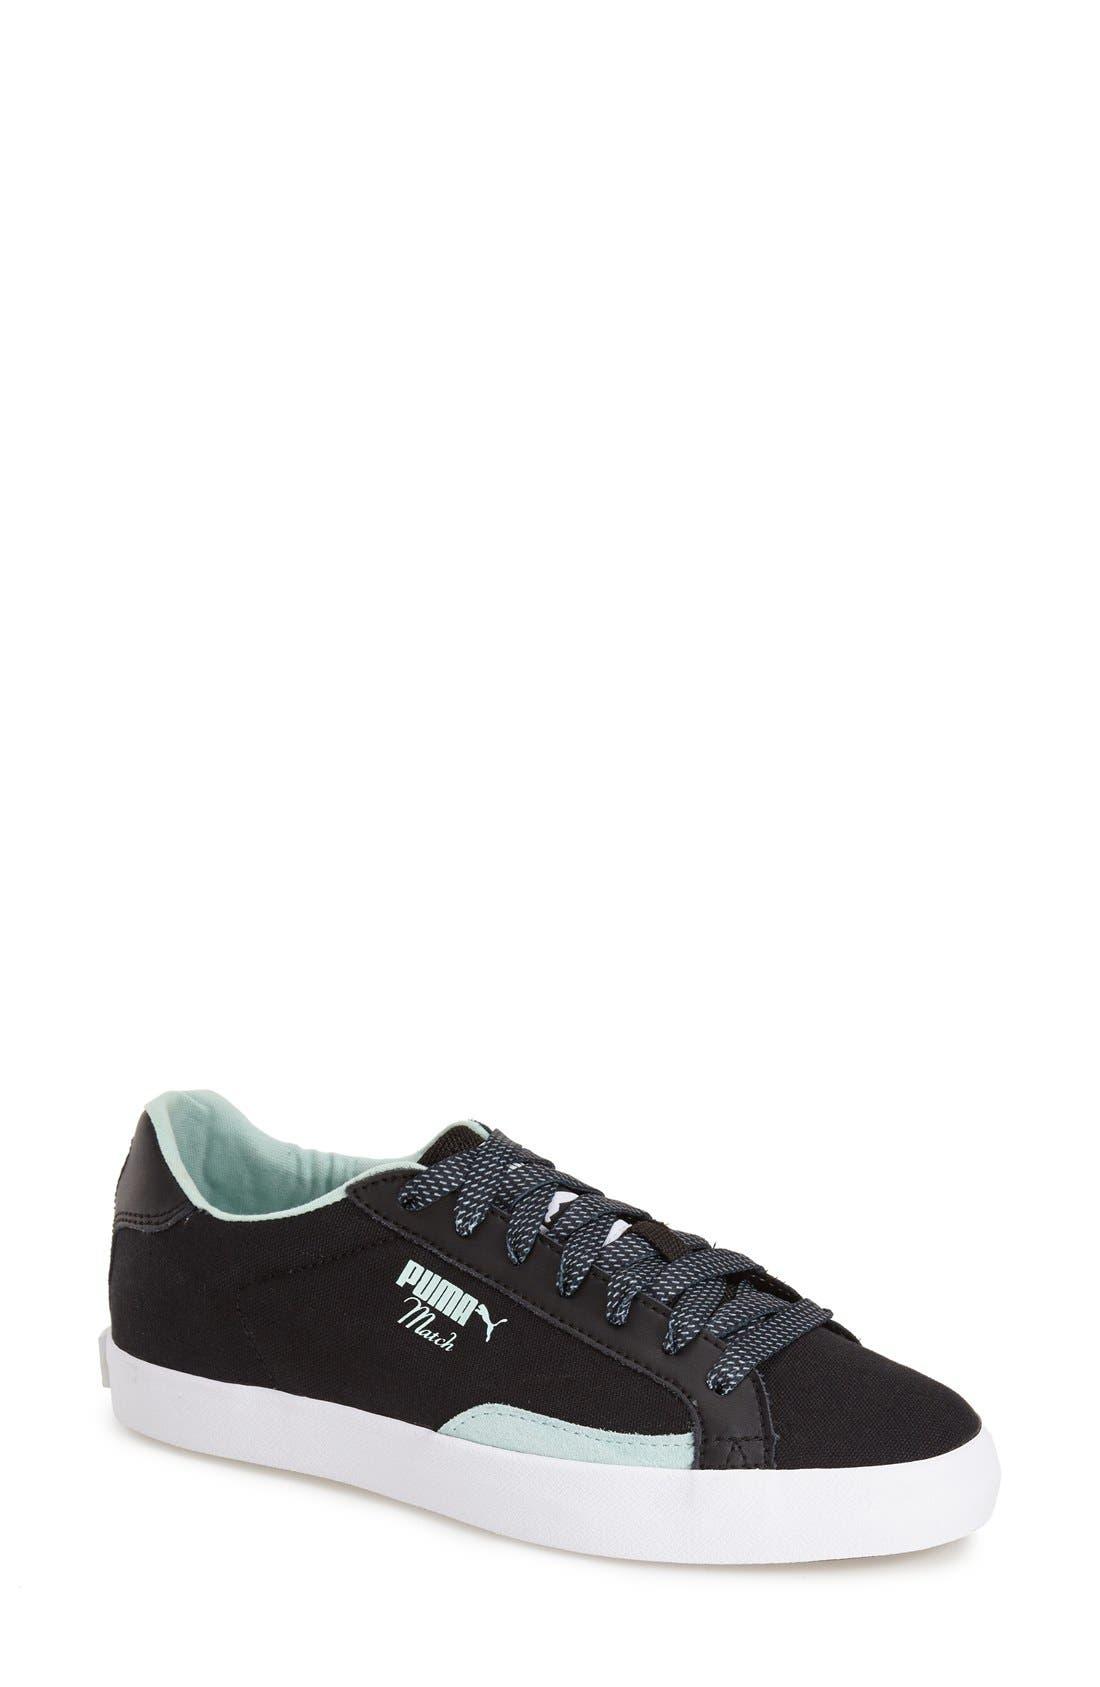 Alternate Image 1 Selected - PUMA 'Match Vulc' Sneaker (Women)